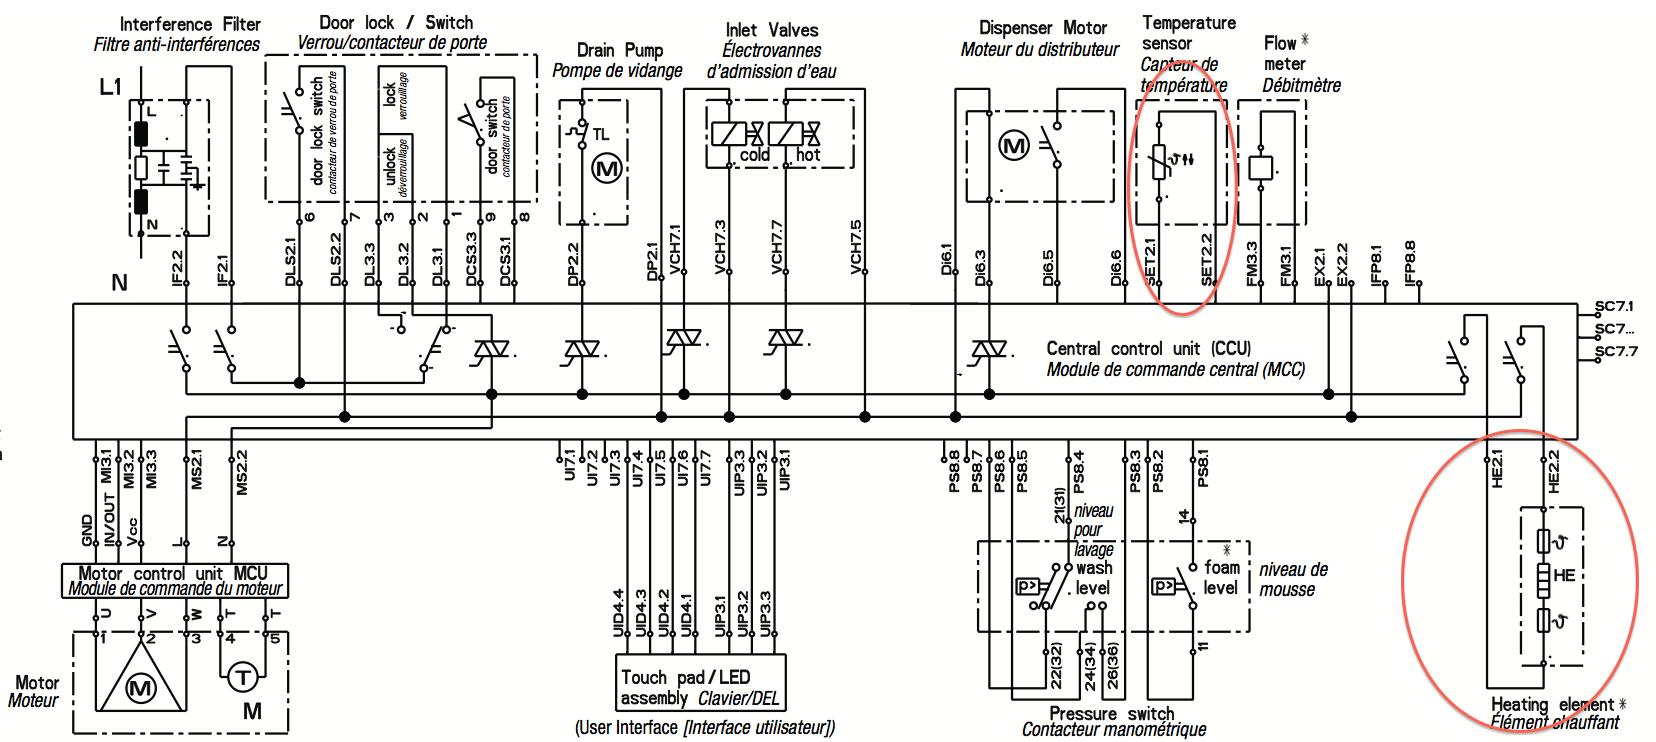 Whirlpool Duet Wiring Diagram - 2008 Honda Pilot Fuel Filter Location -  diagramford.2020ok-jiwa.jeanjaures37.frWiring Diagram Resource